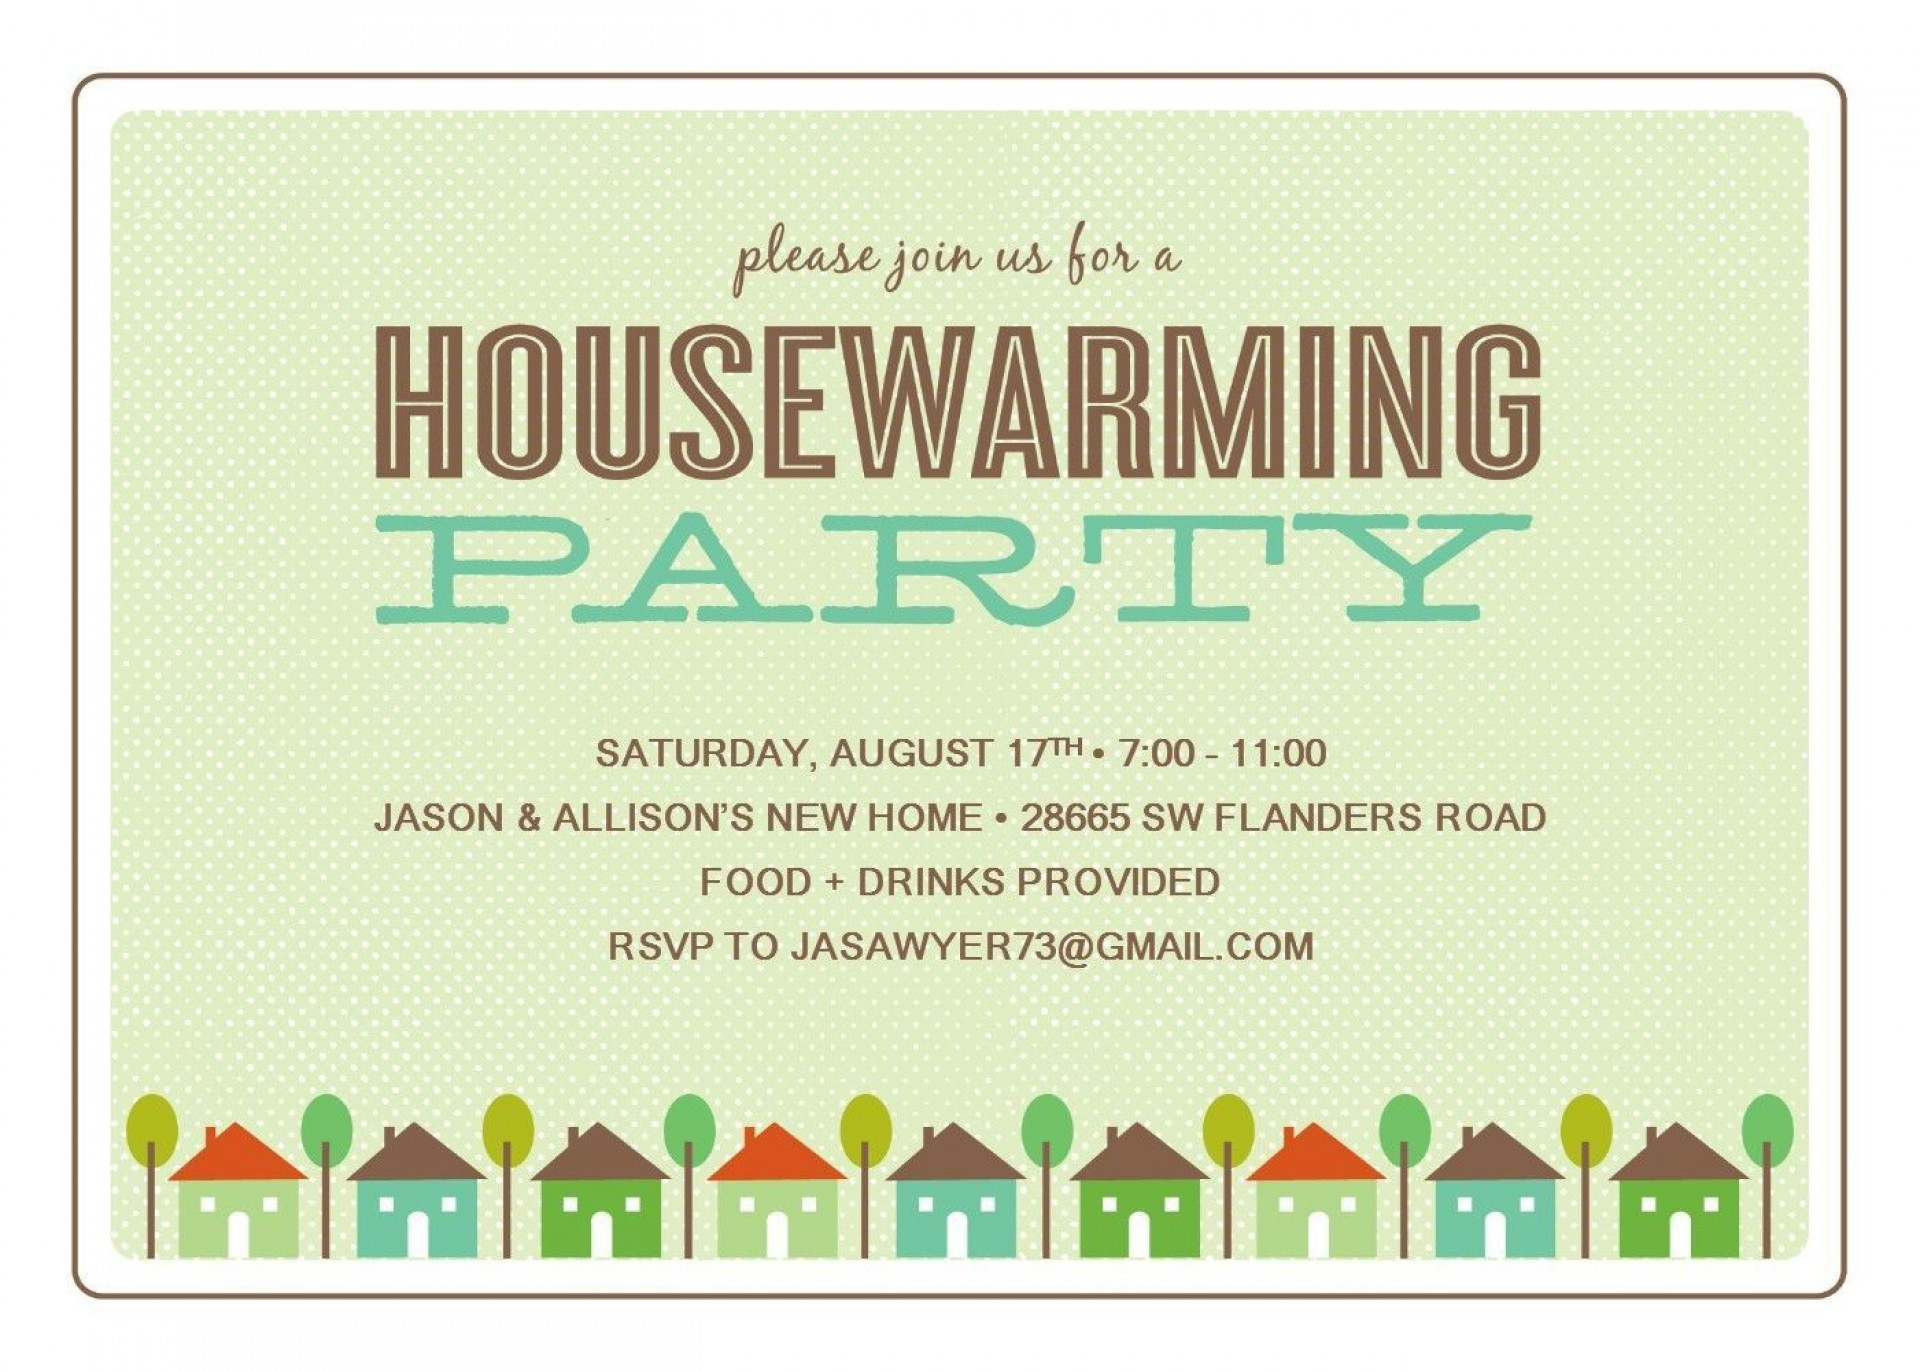 001 Incredible Free Housewarming Invitation Template Idea  Templates Printable India Video Download1920